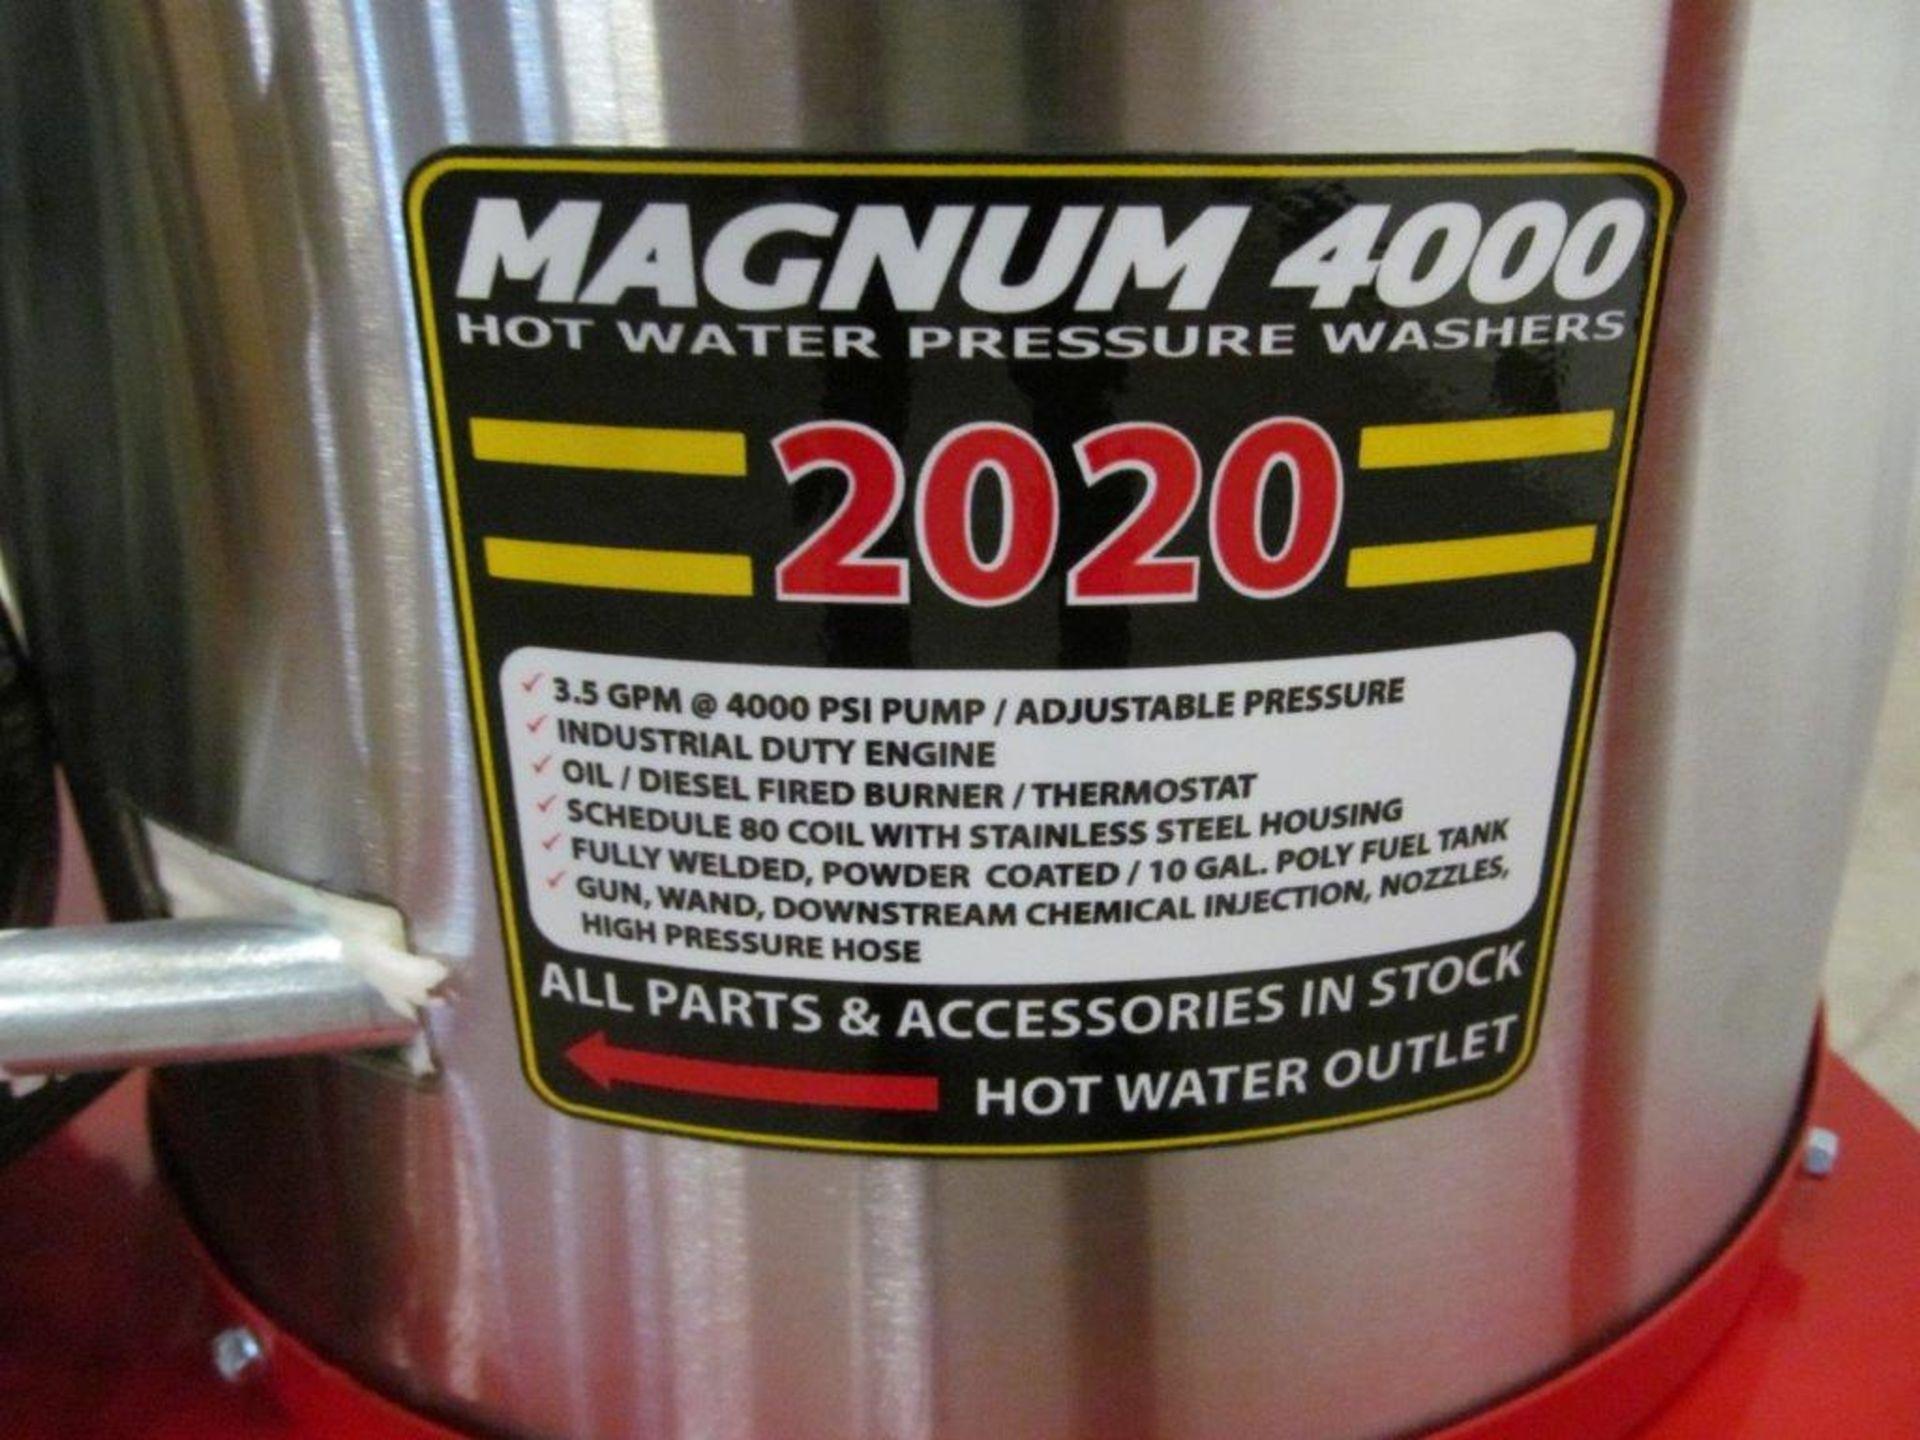 (NEW) EASY-KLEEN HOT WATER PRESSURE WASHER, MDL. MAGNUM GOLD, 15 HP ENGINE. DIESEL FIRED BURNER - Image 10 of 12